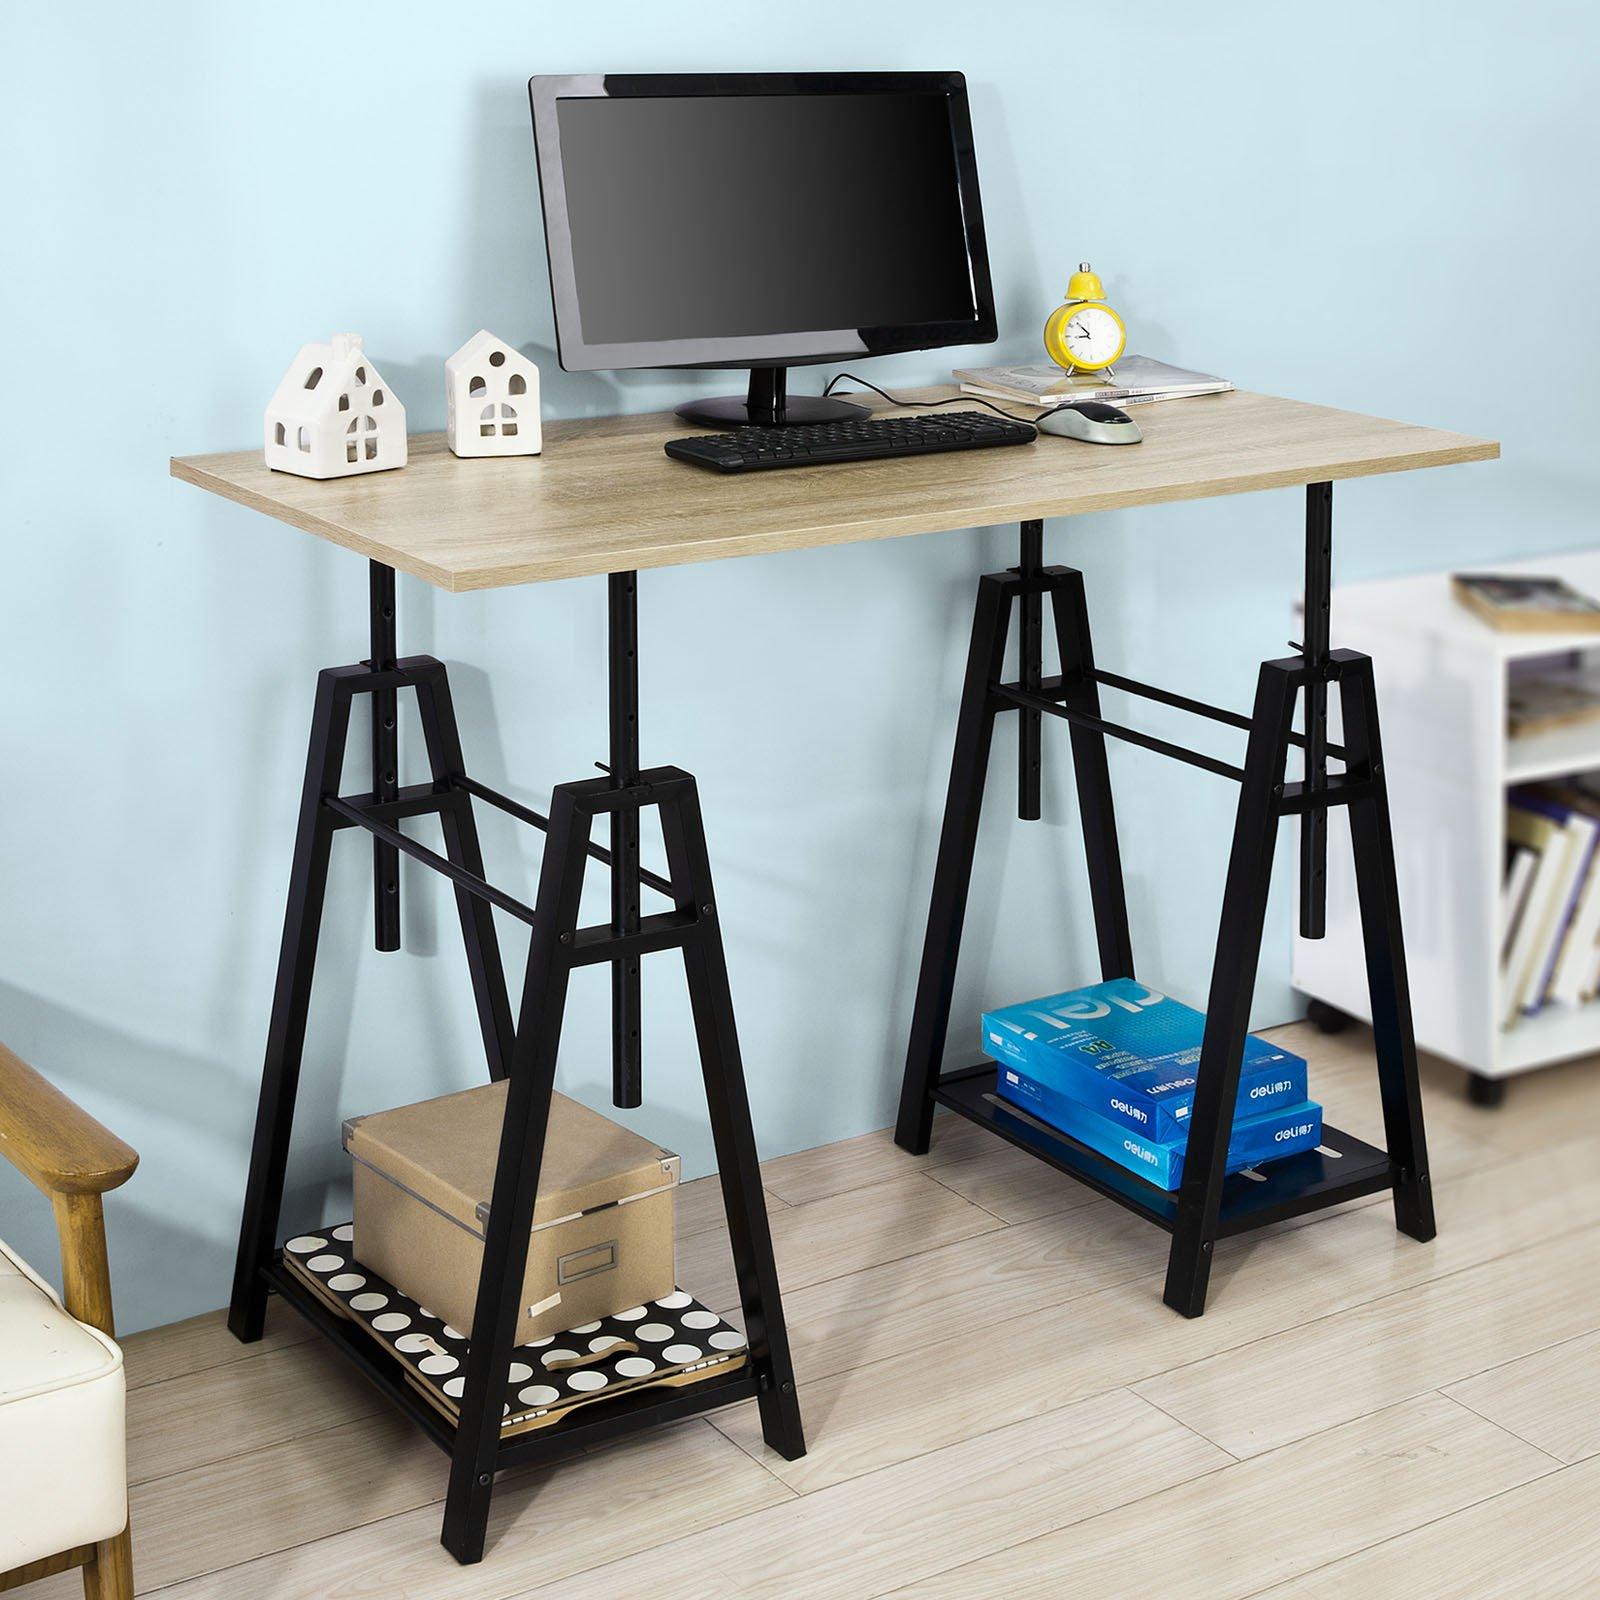 Haotian,Trestle Table Desk Height Adjustable, Home Office Table Desk Computer Workstation,FWT32-N